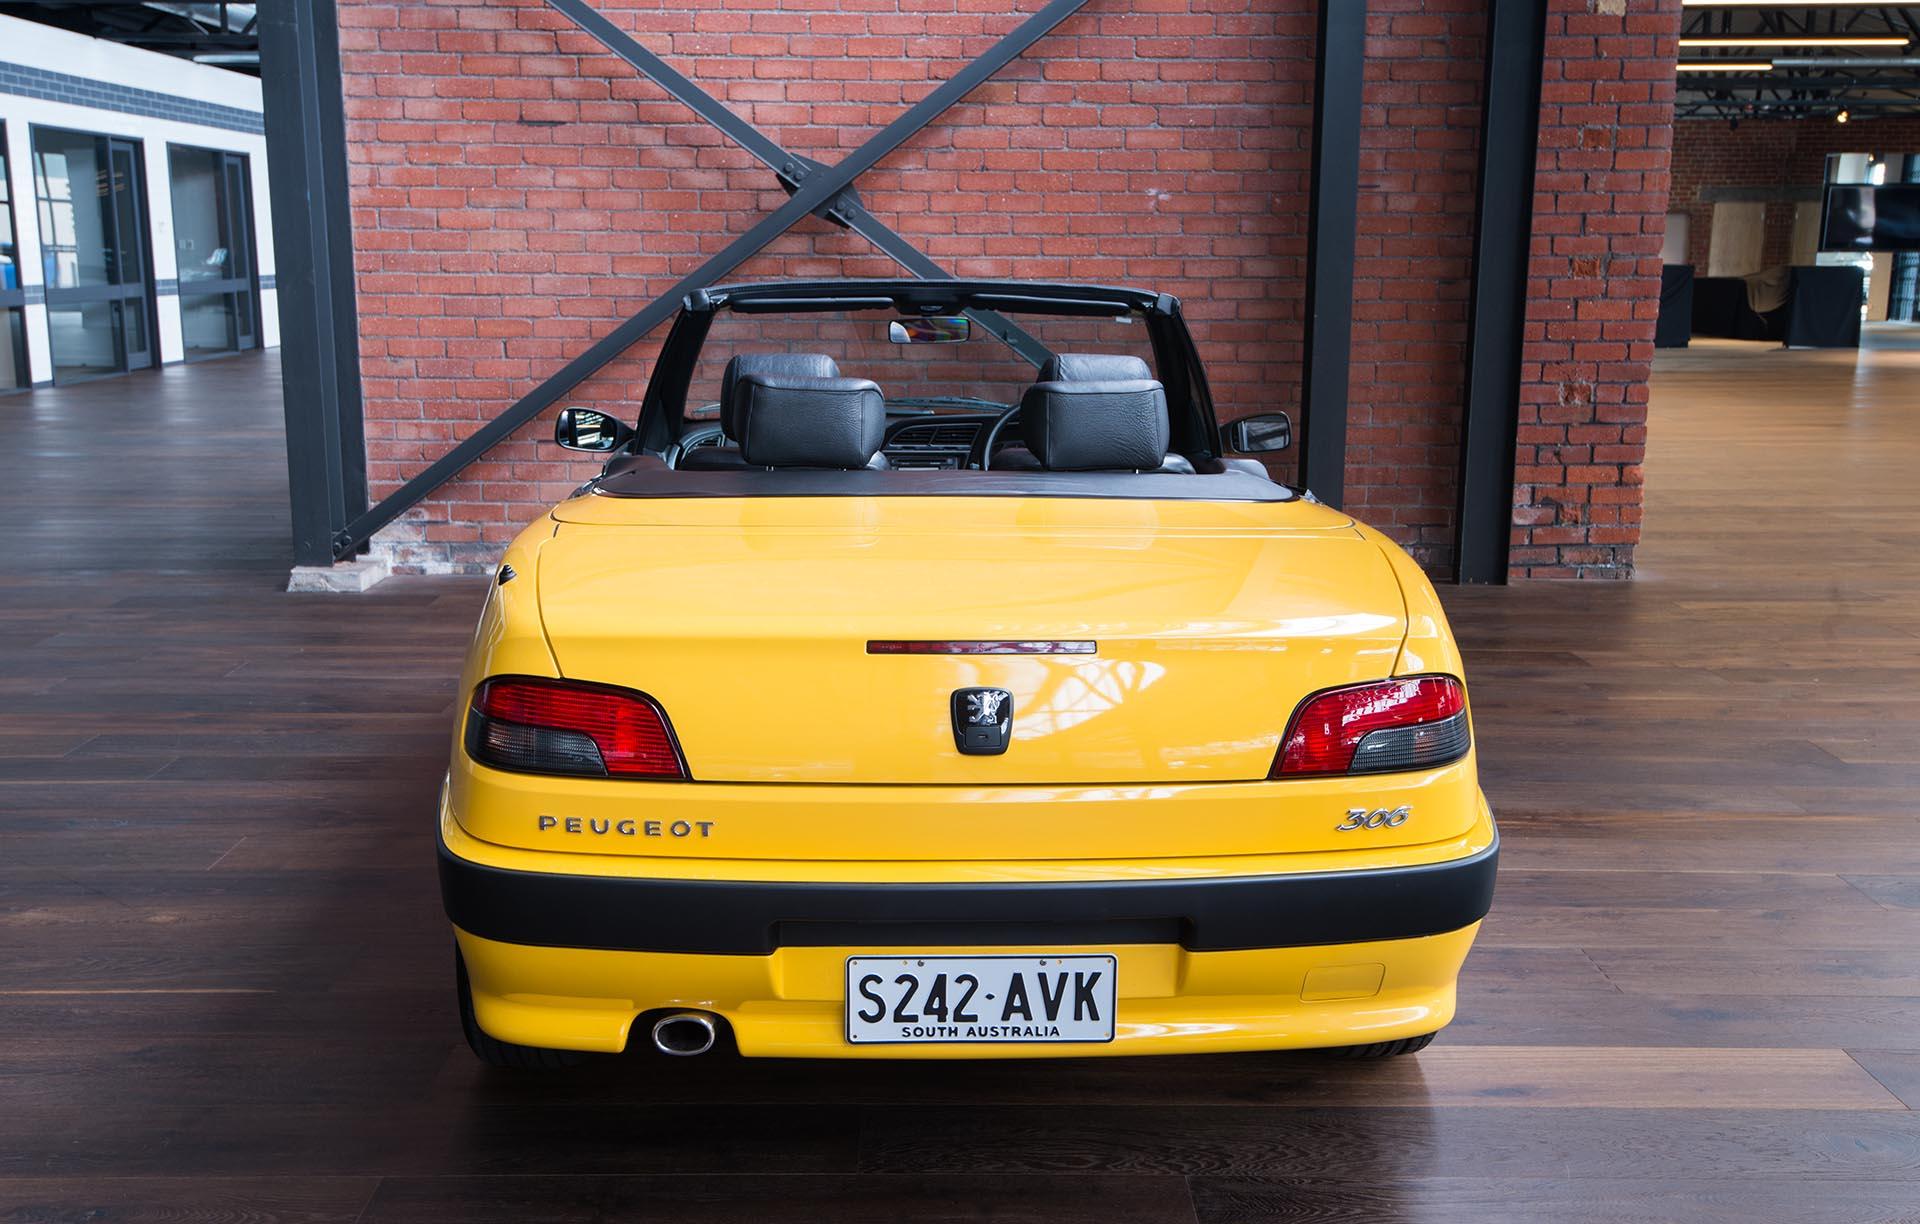 2001 peugeot 306 cabriolet for sale richmonds classic sports cars. Black Bedroom Furniture Sets. Home Design Ideas